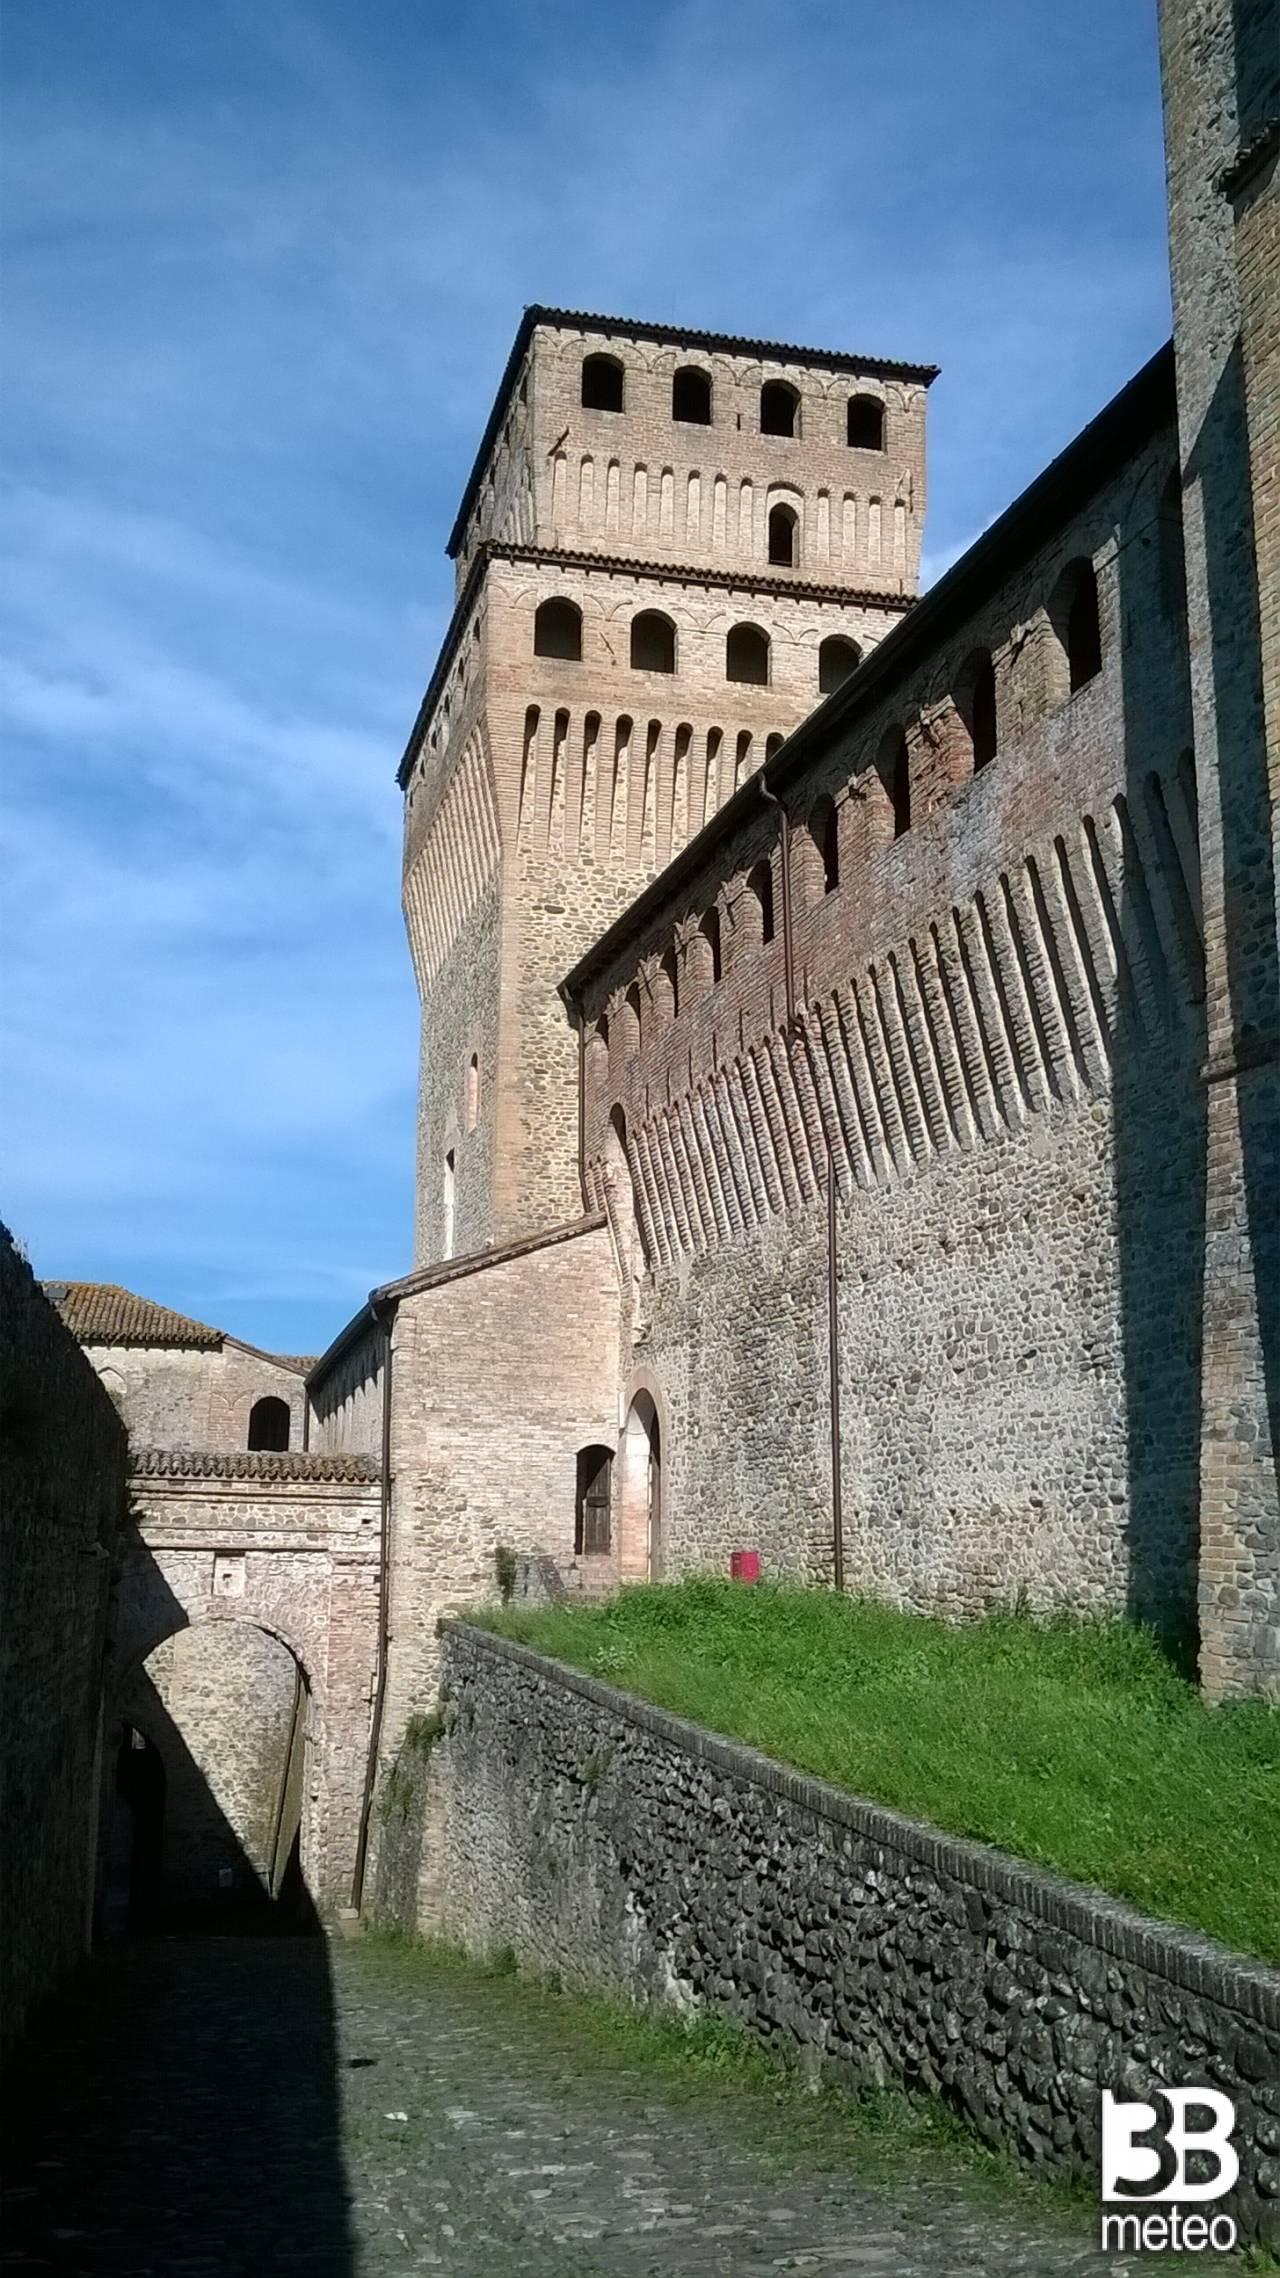 Castello di torrechiara foto gallery 3b meteo - 3b meteo bagno di romagna ...